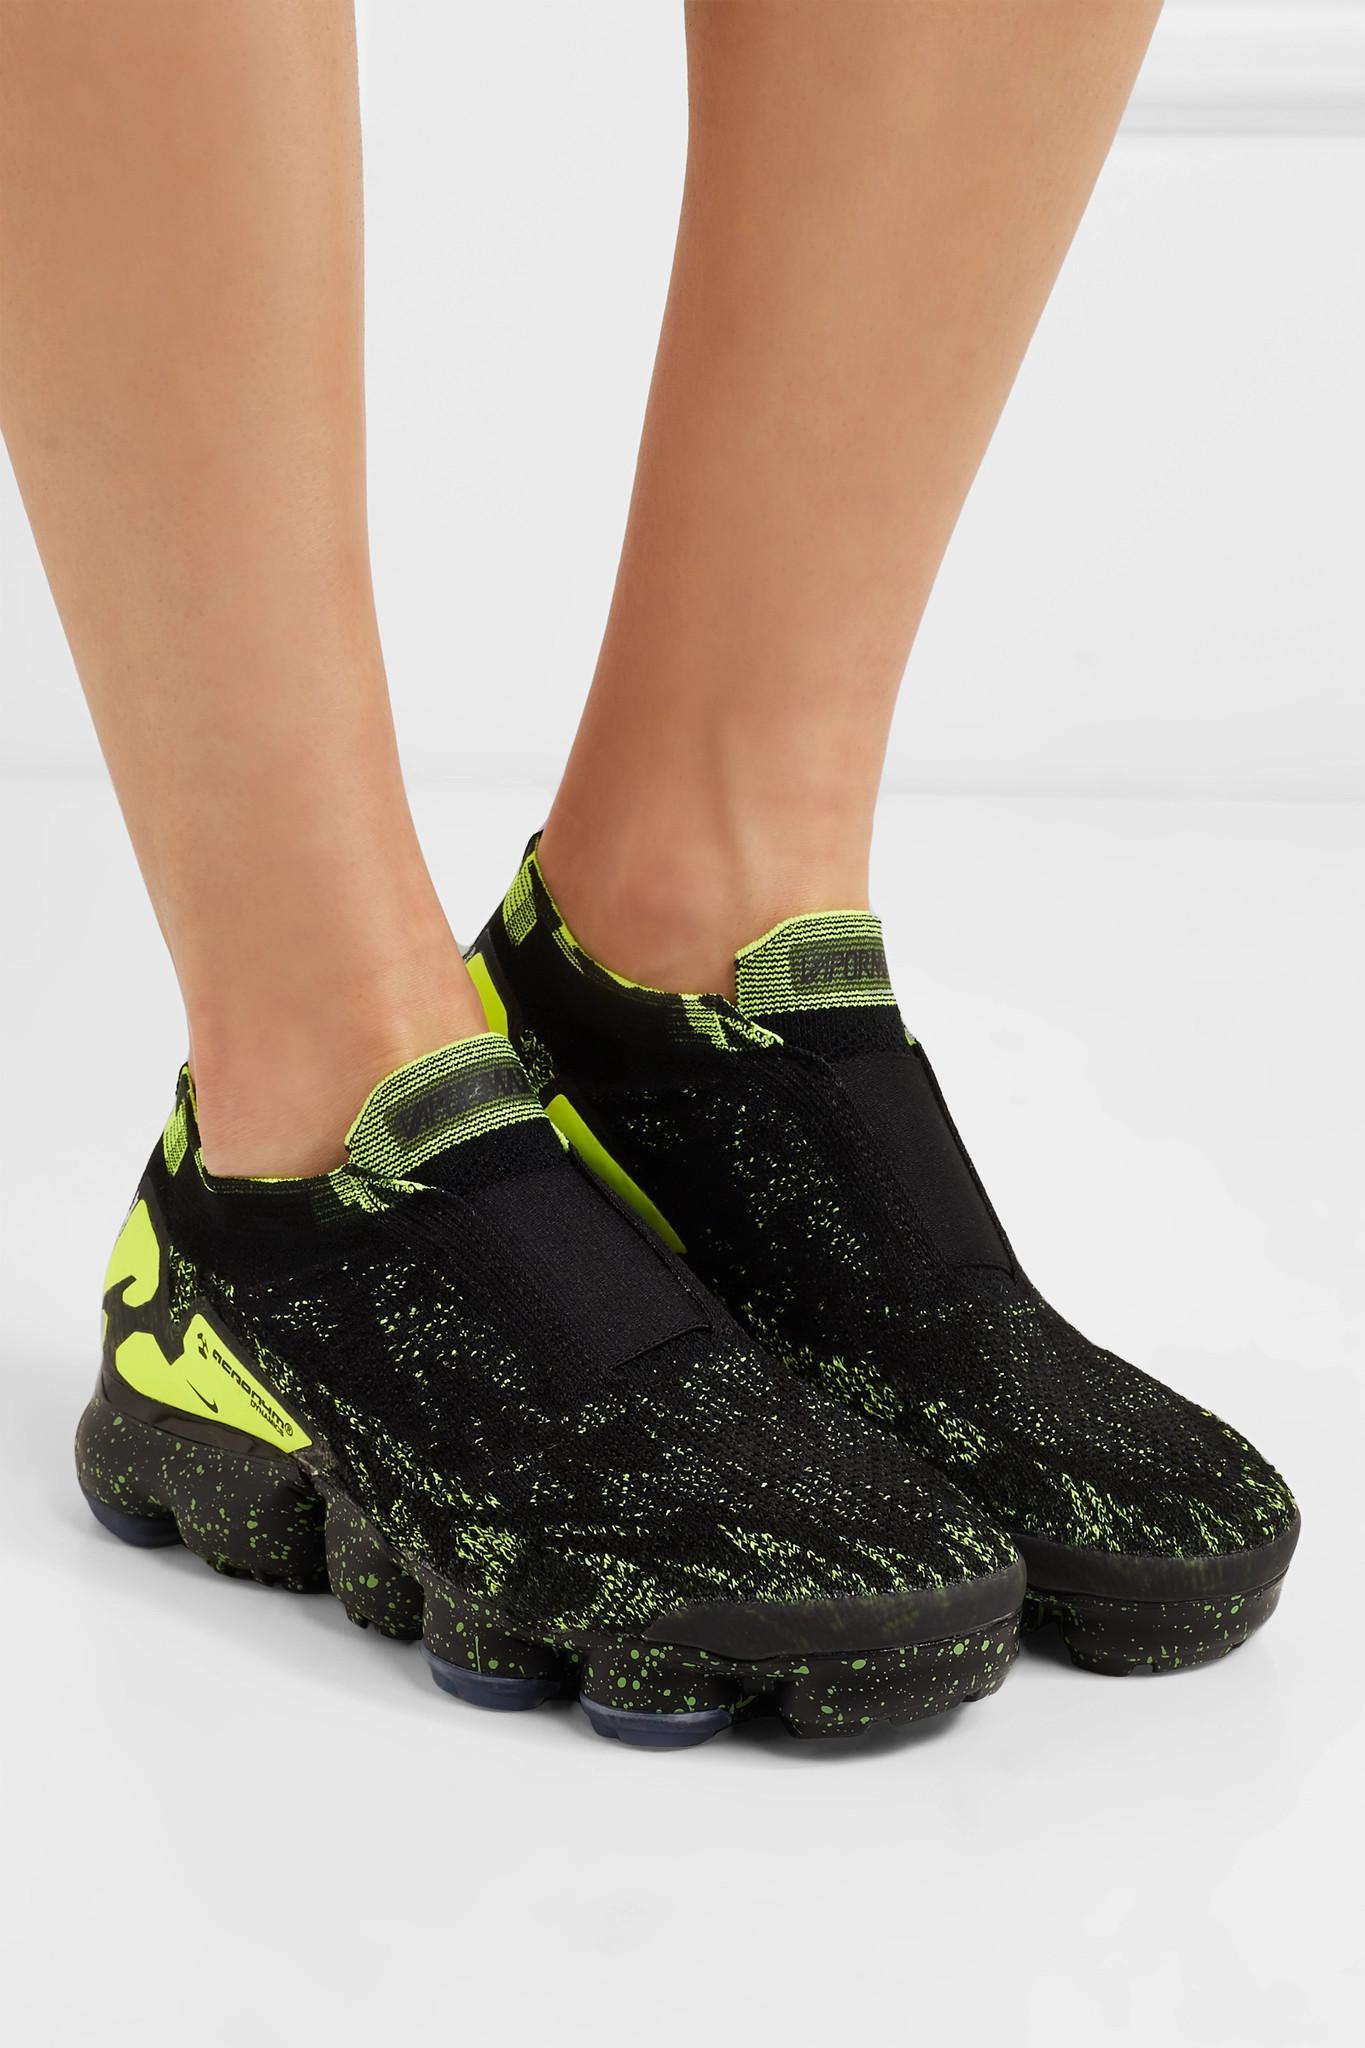 9ff1439b92eb8 Nike + Acronym Air Vapormax Moc 2 Printed Flyknit Sneakers in Black ...